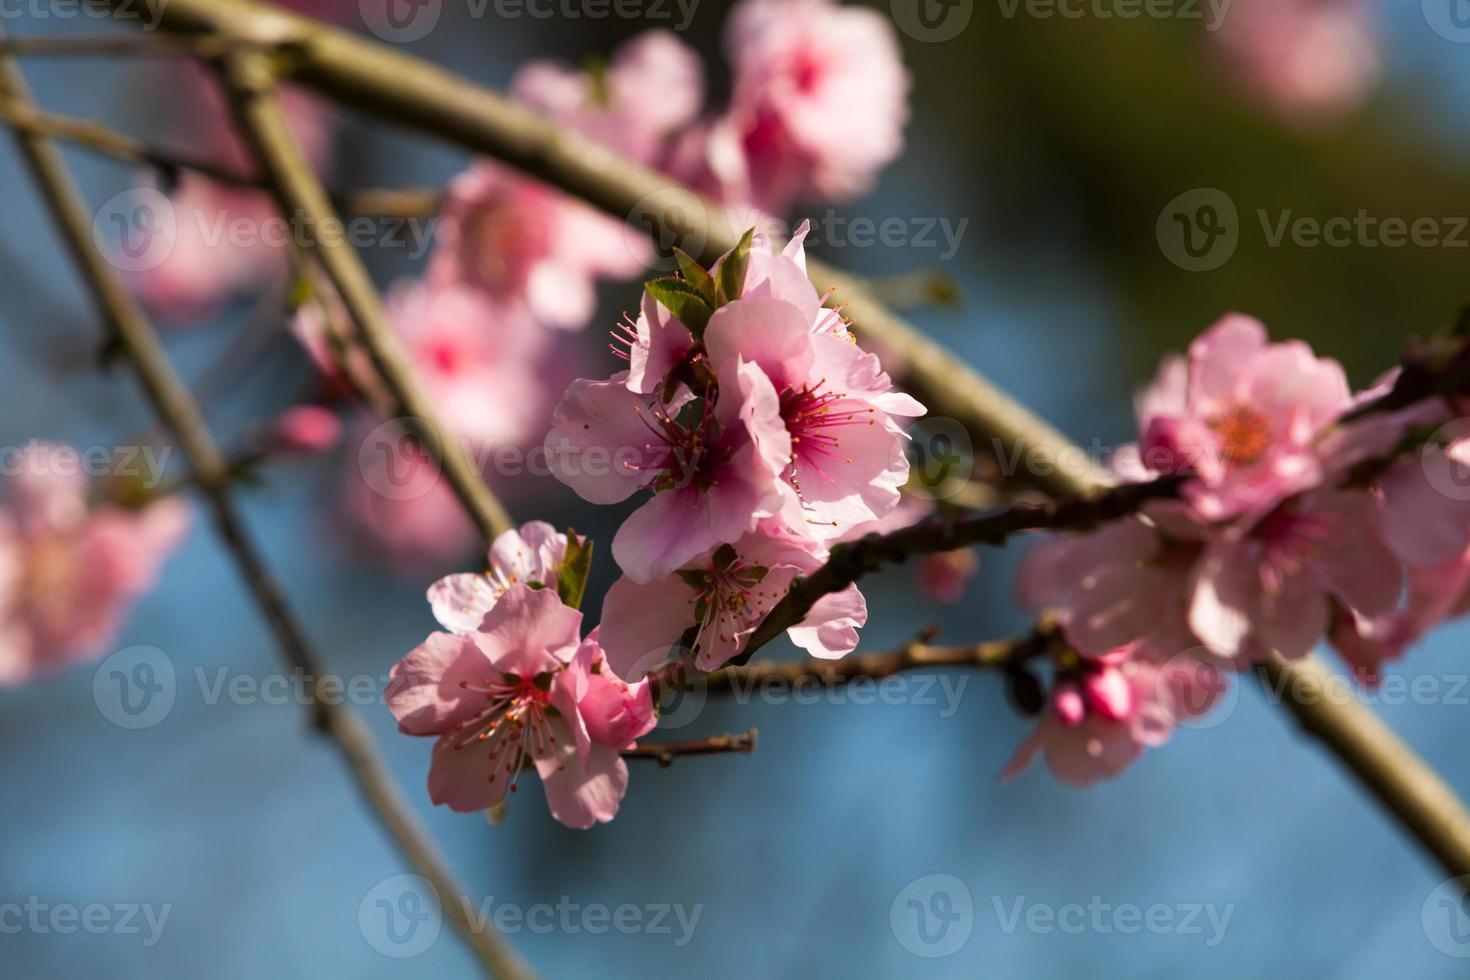 kersenbloesem, sakura bloemen foto